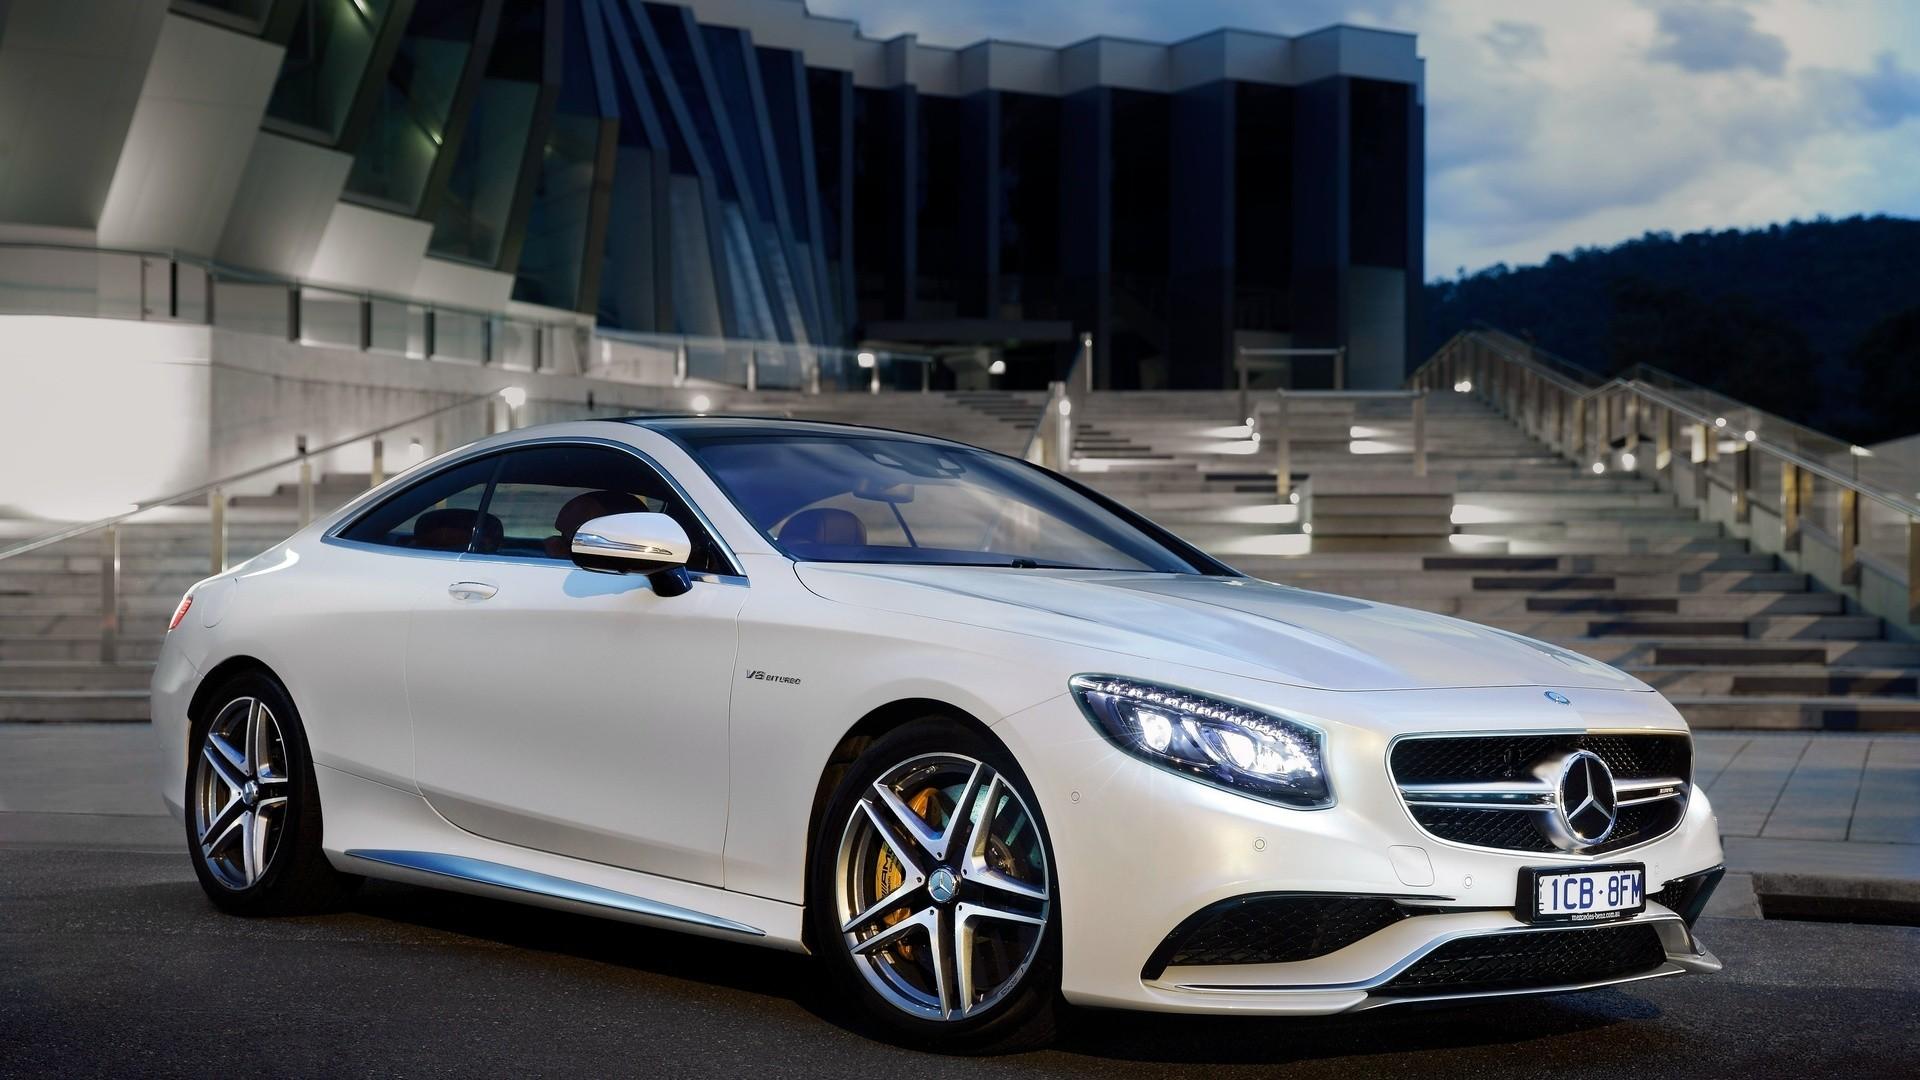 Mercedes Wallpaper Download Full